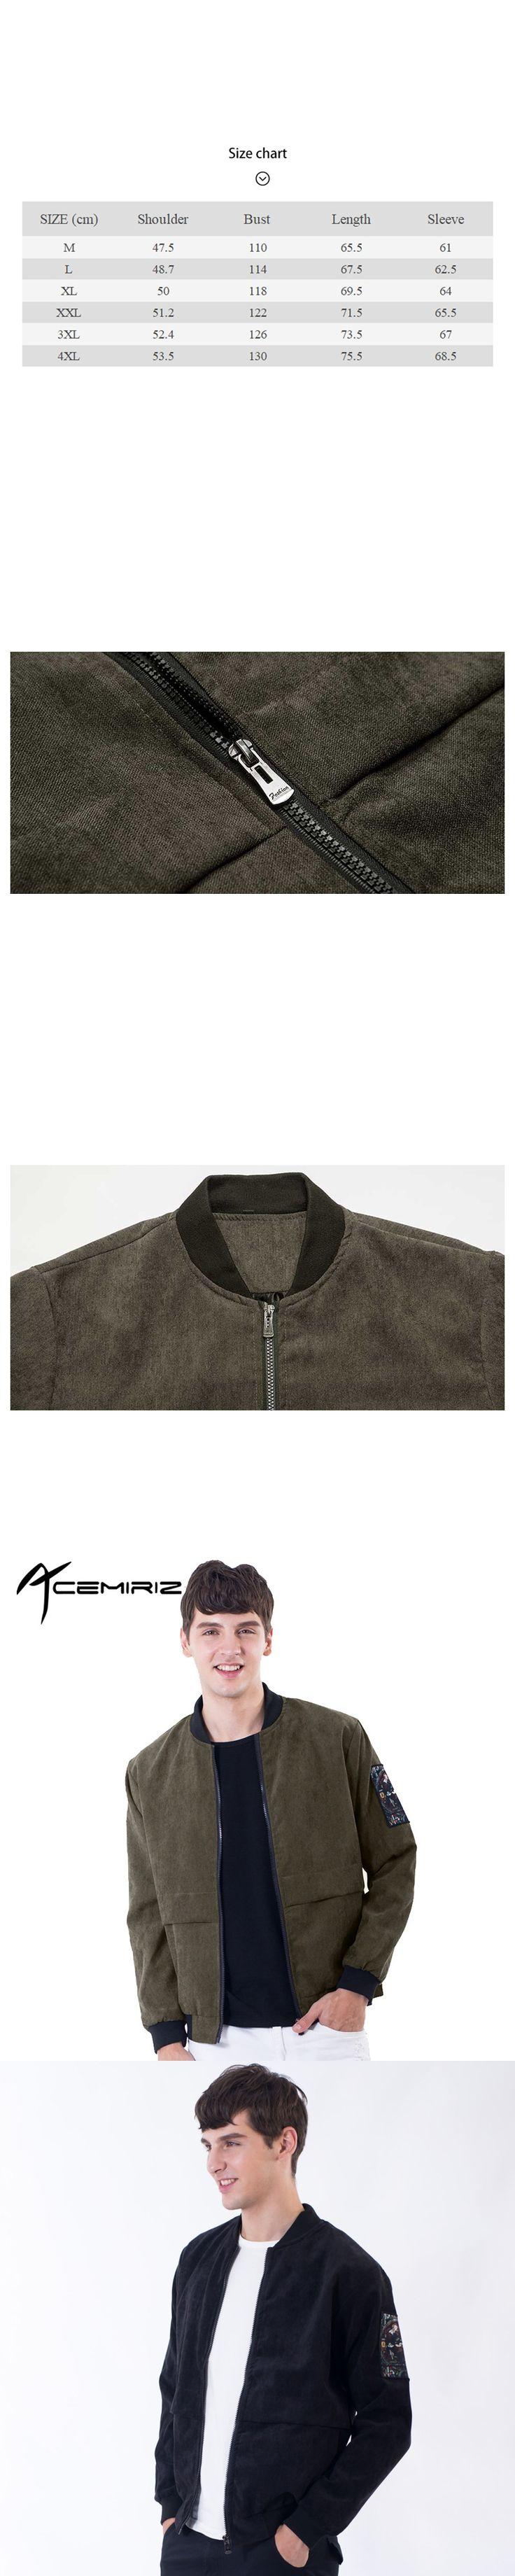 ACEMIRIZ New Bomber Jacket Men Casual Corduroy Jacket 2017 Fashion Spring Autumn High Quality Masculino Coat T-J24